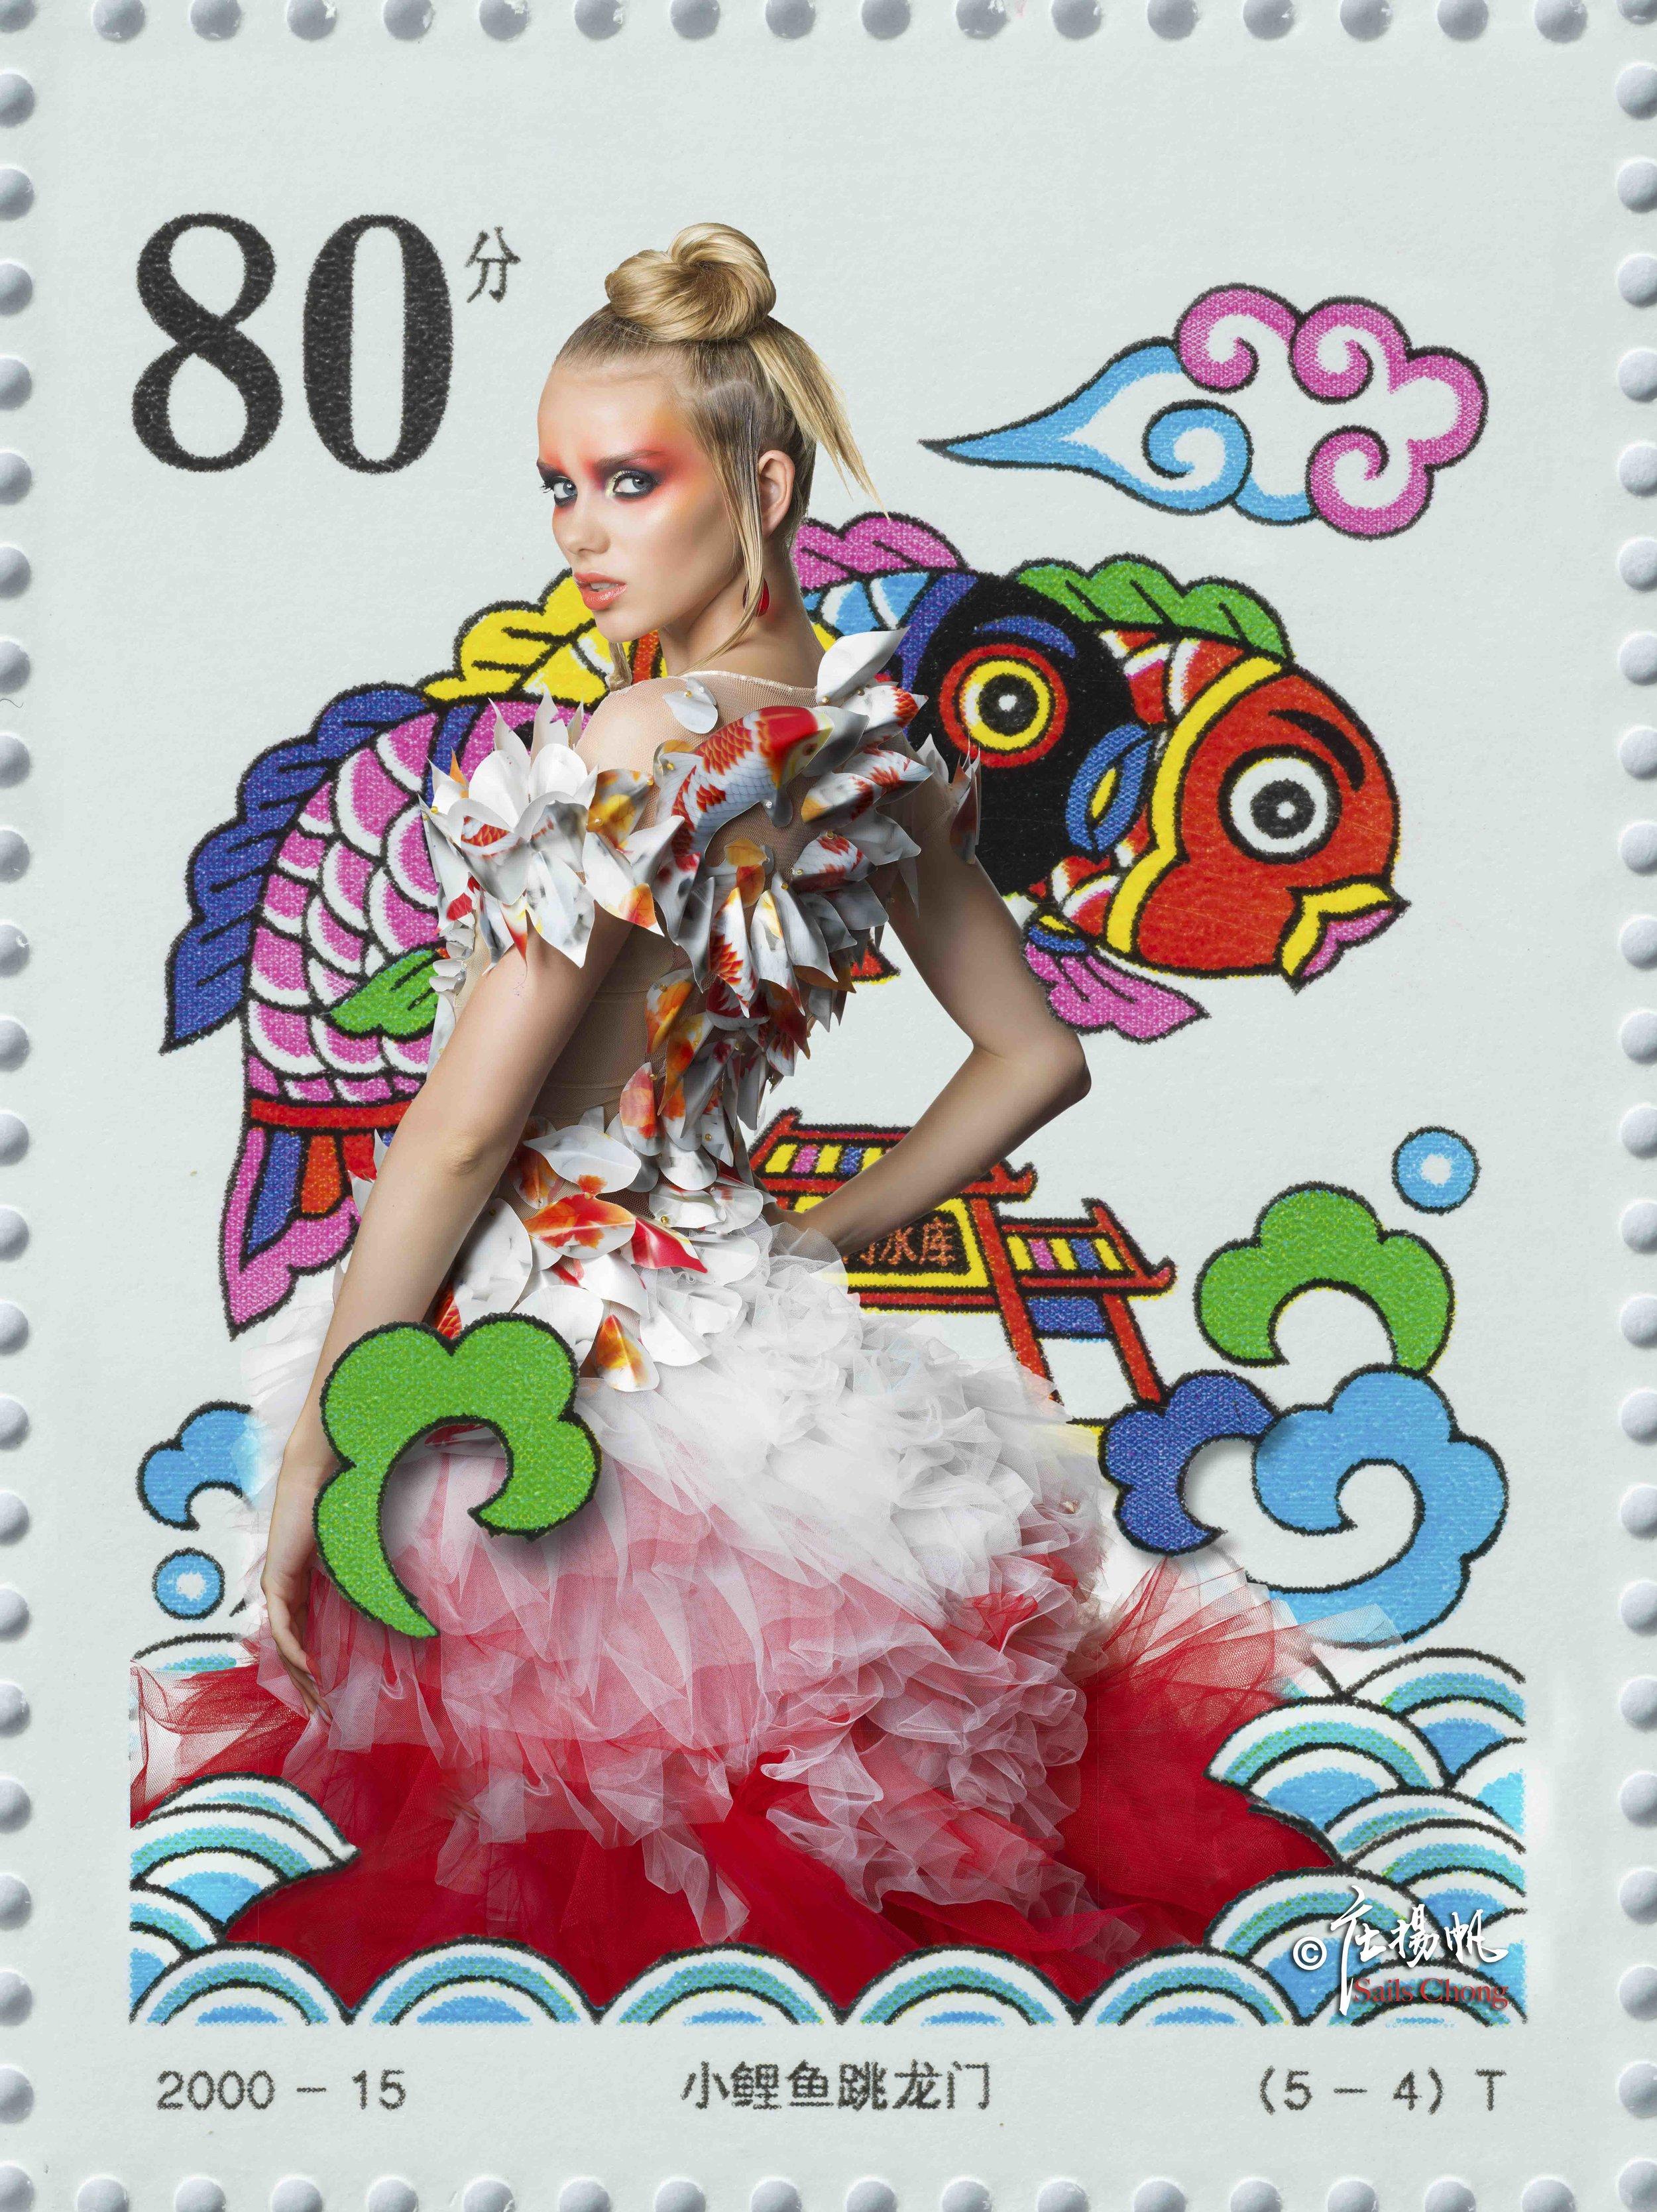 Production: Awamu Moja / Photographer: Sails Chong / Fashion Designer: Huiqin Peng / Model: Lola Alc / MUA: Paddy McGurgan / Hairstylist: Valentina Becker